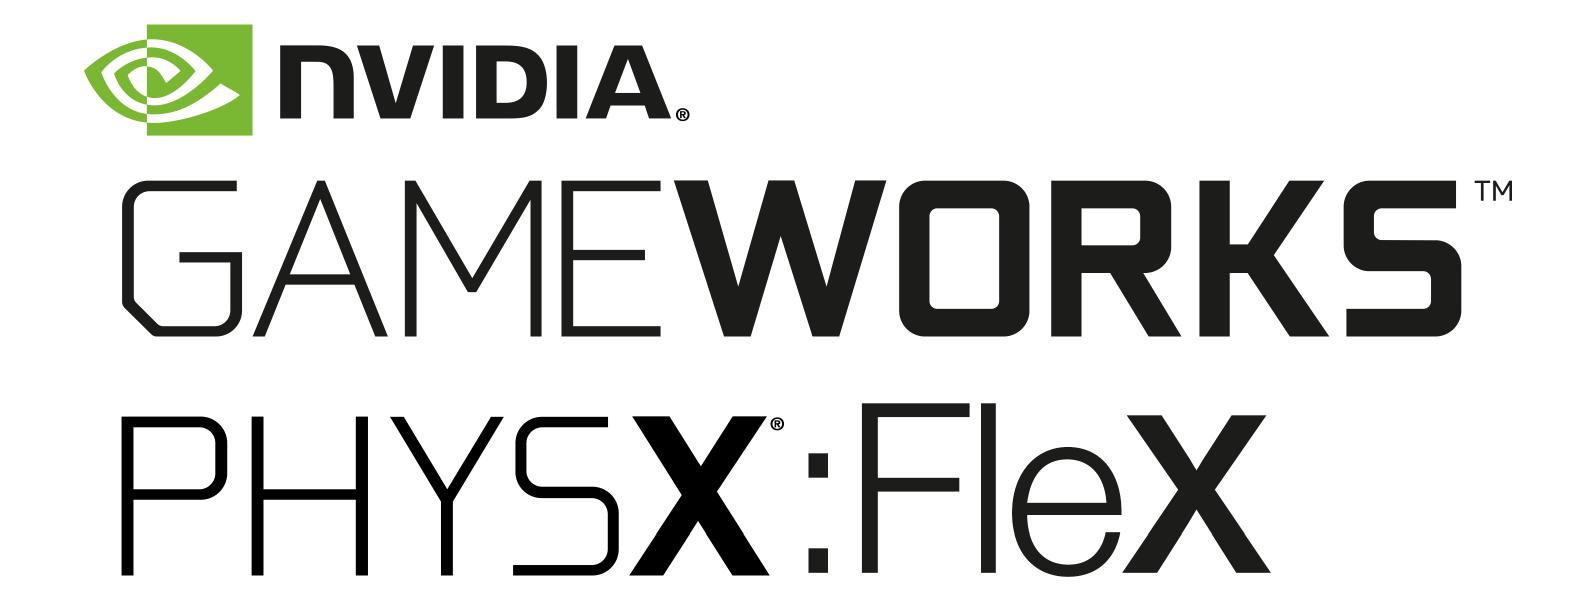 NVIDIA PhysX FleX logo